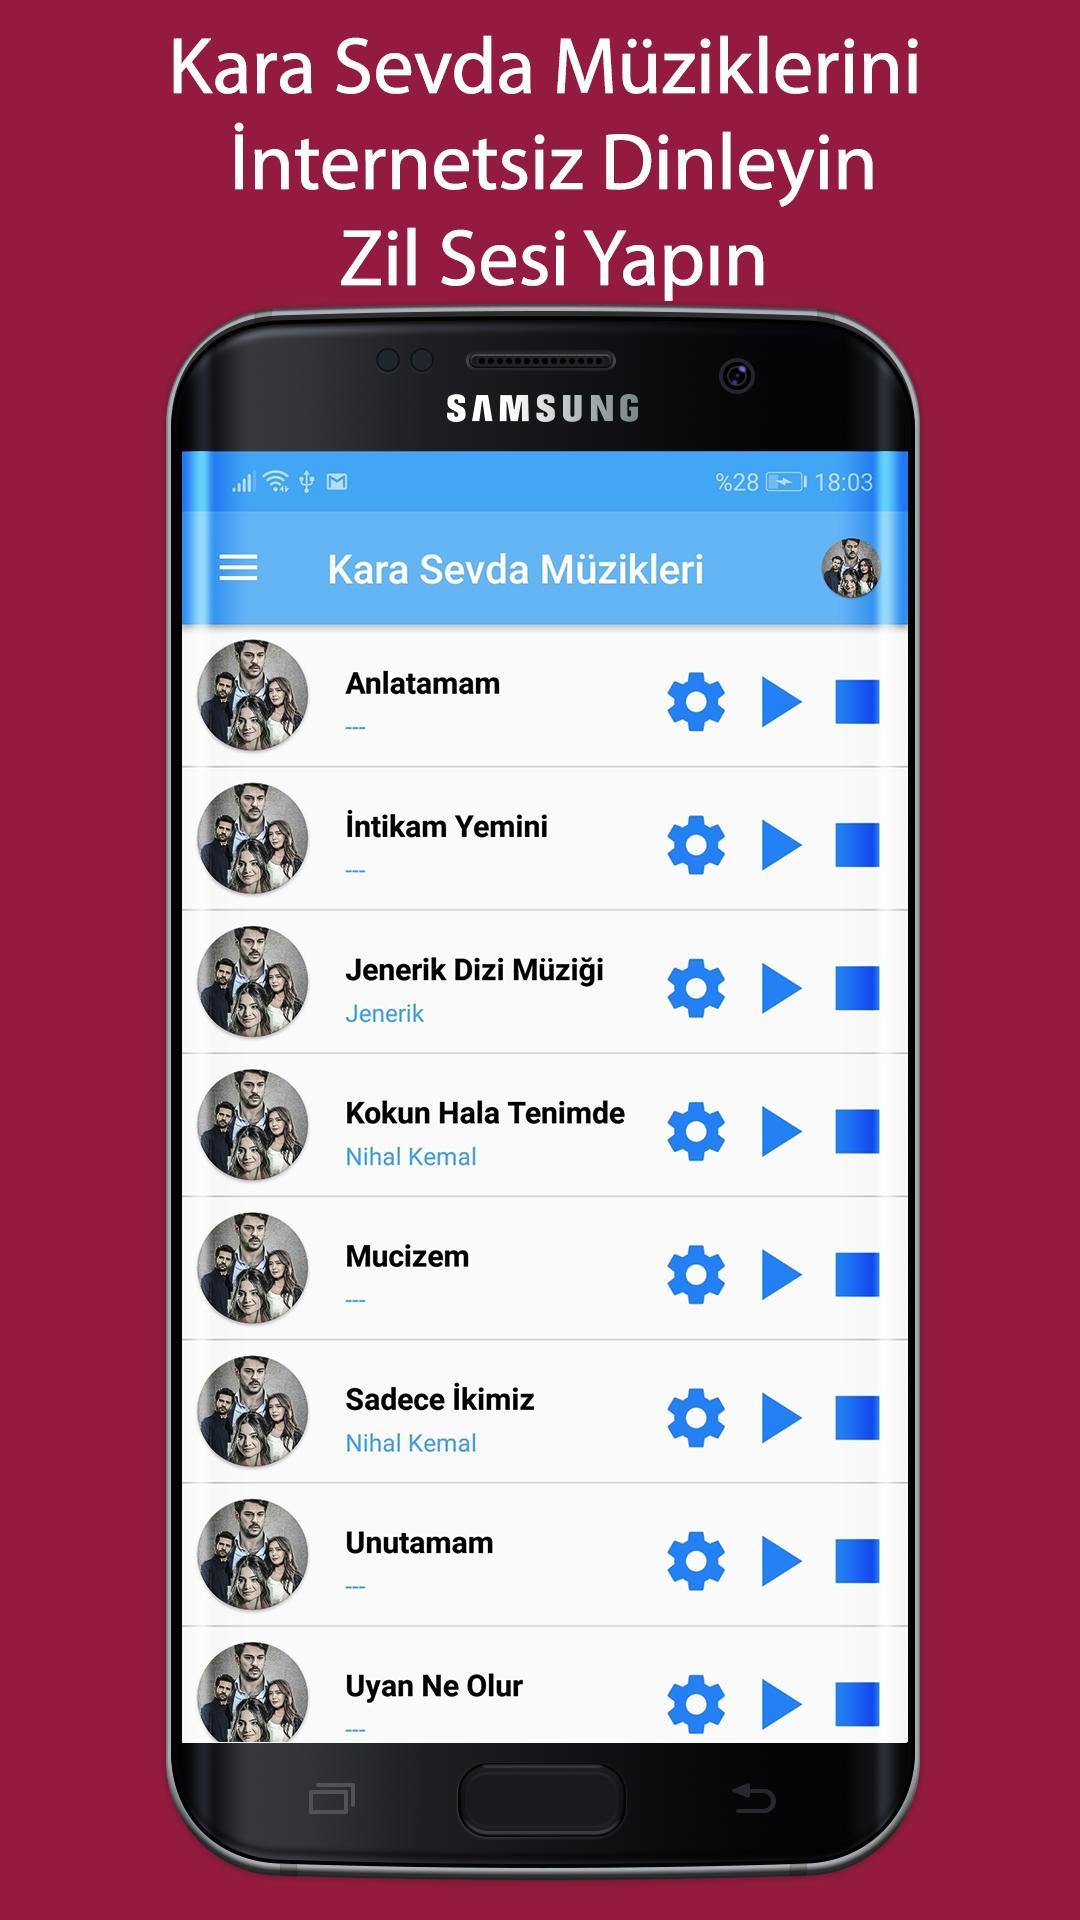 Kara Sevda Dizi Muzikleri Internetsiz For Android Apk Download